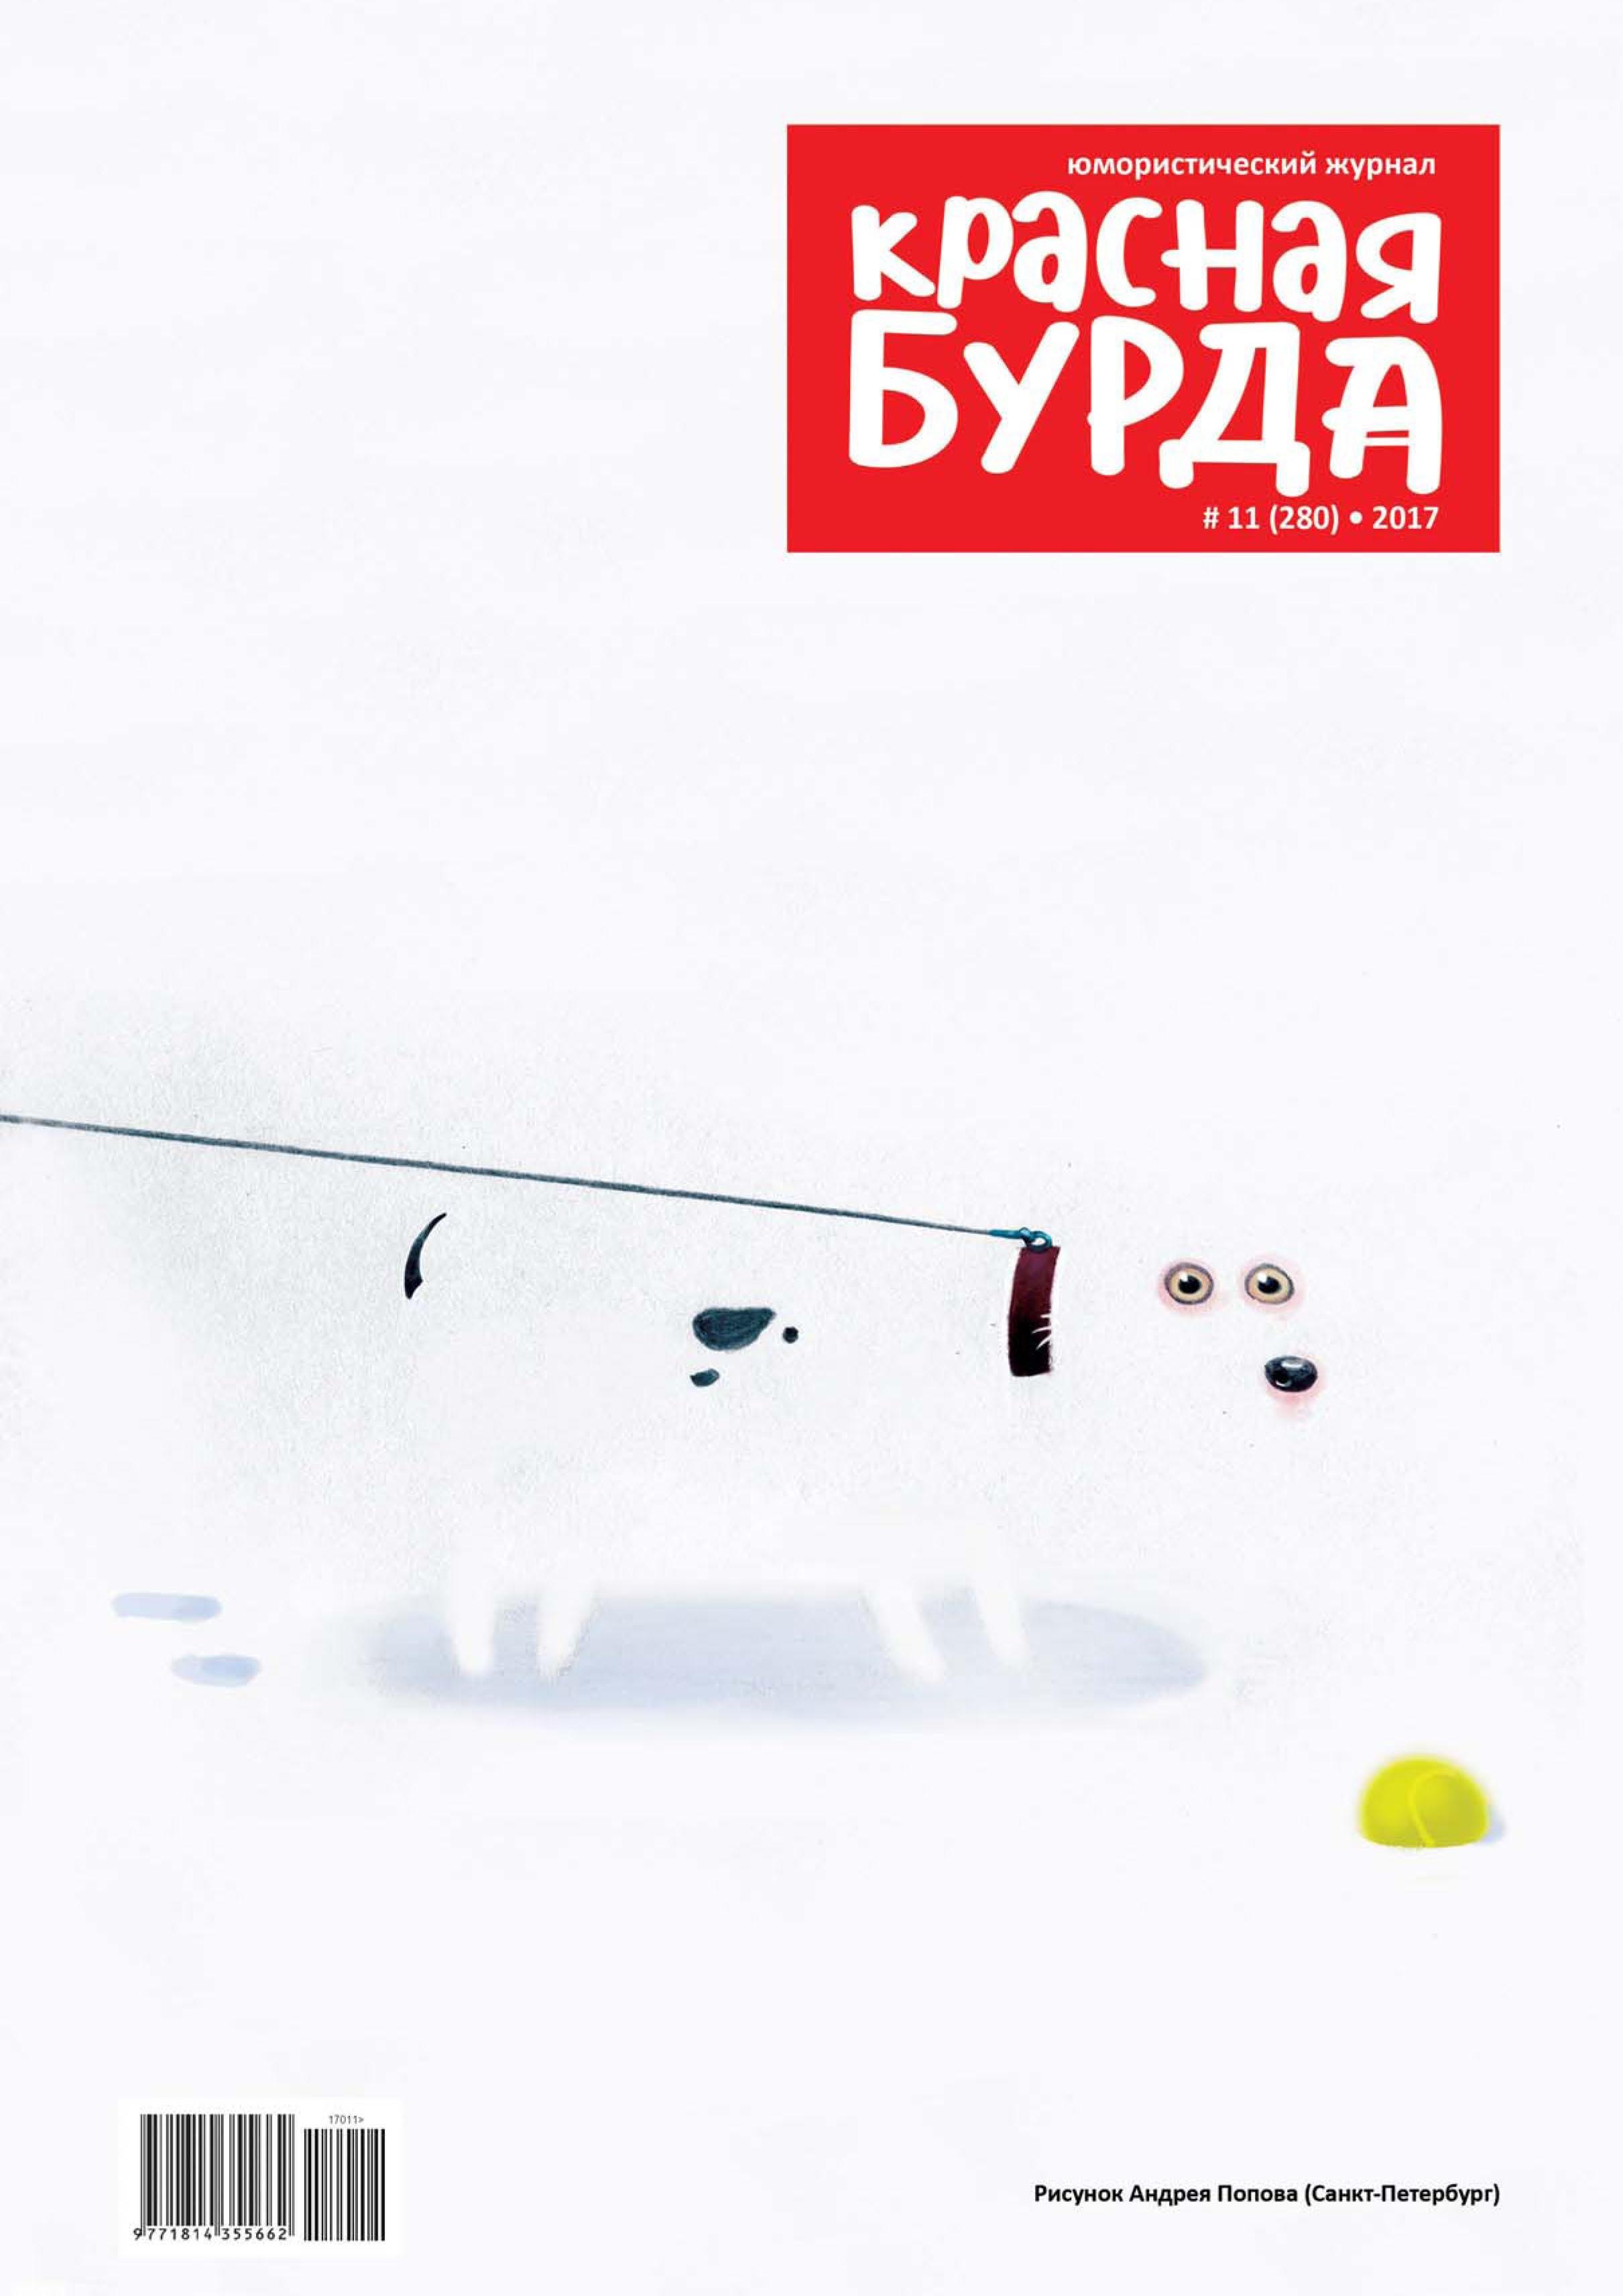 Красная бурда. Юмористический журнал. №11/2017